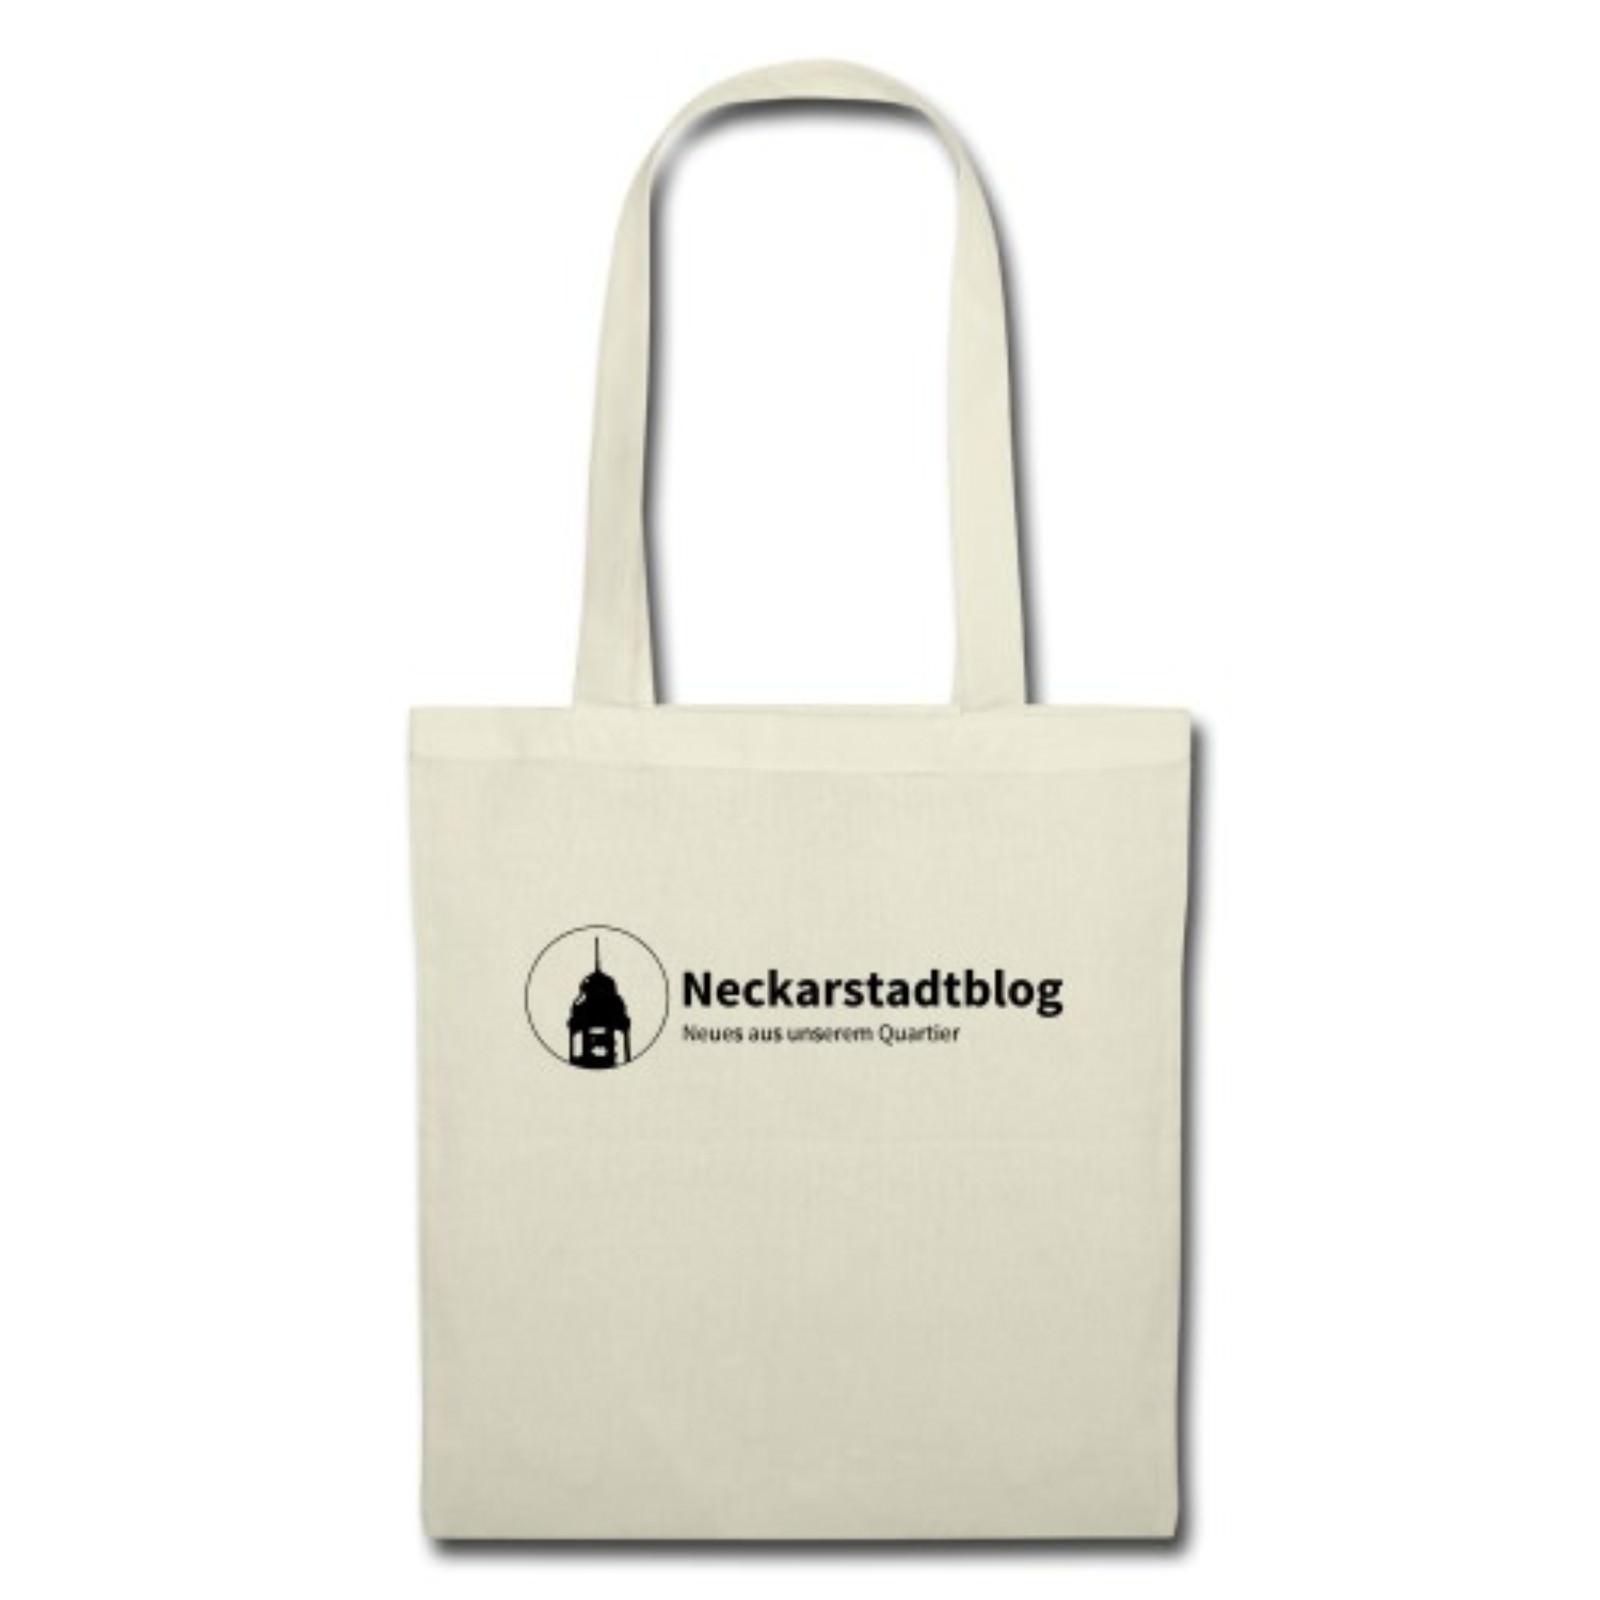 neckarstadtblog-logo-claim-stoffbeutel